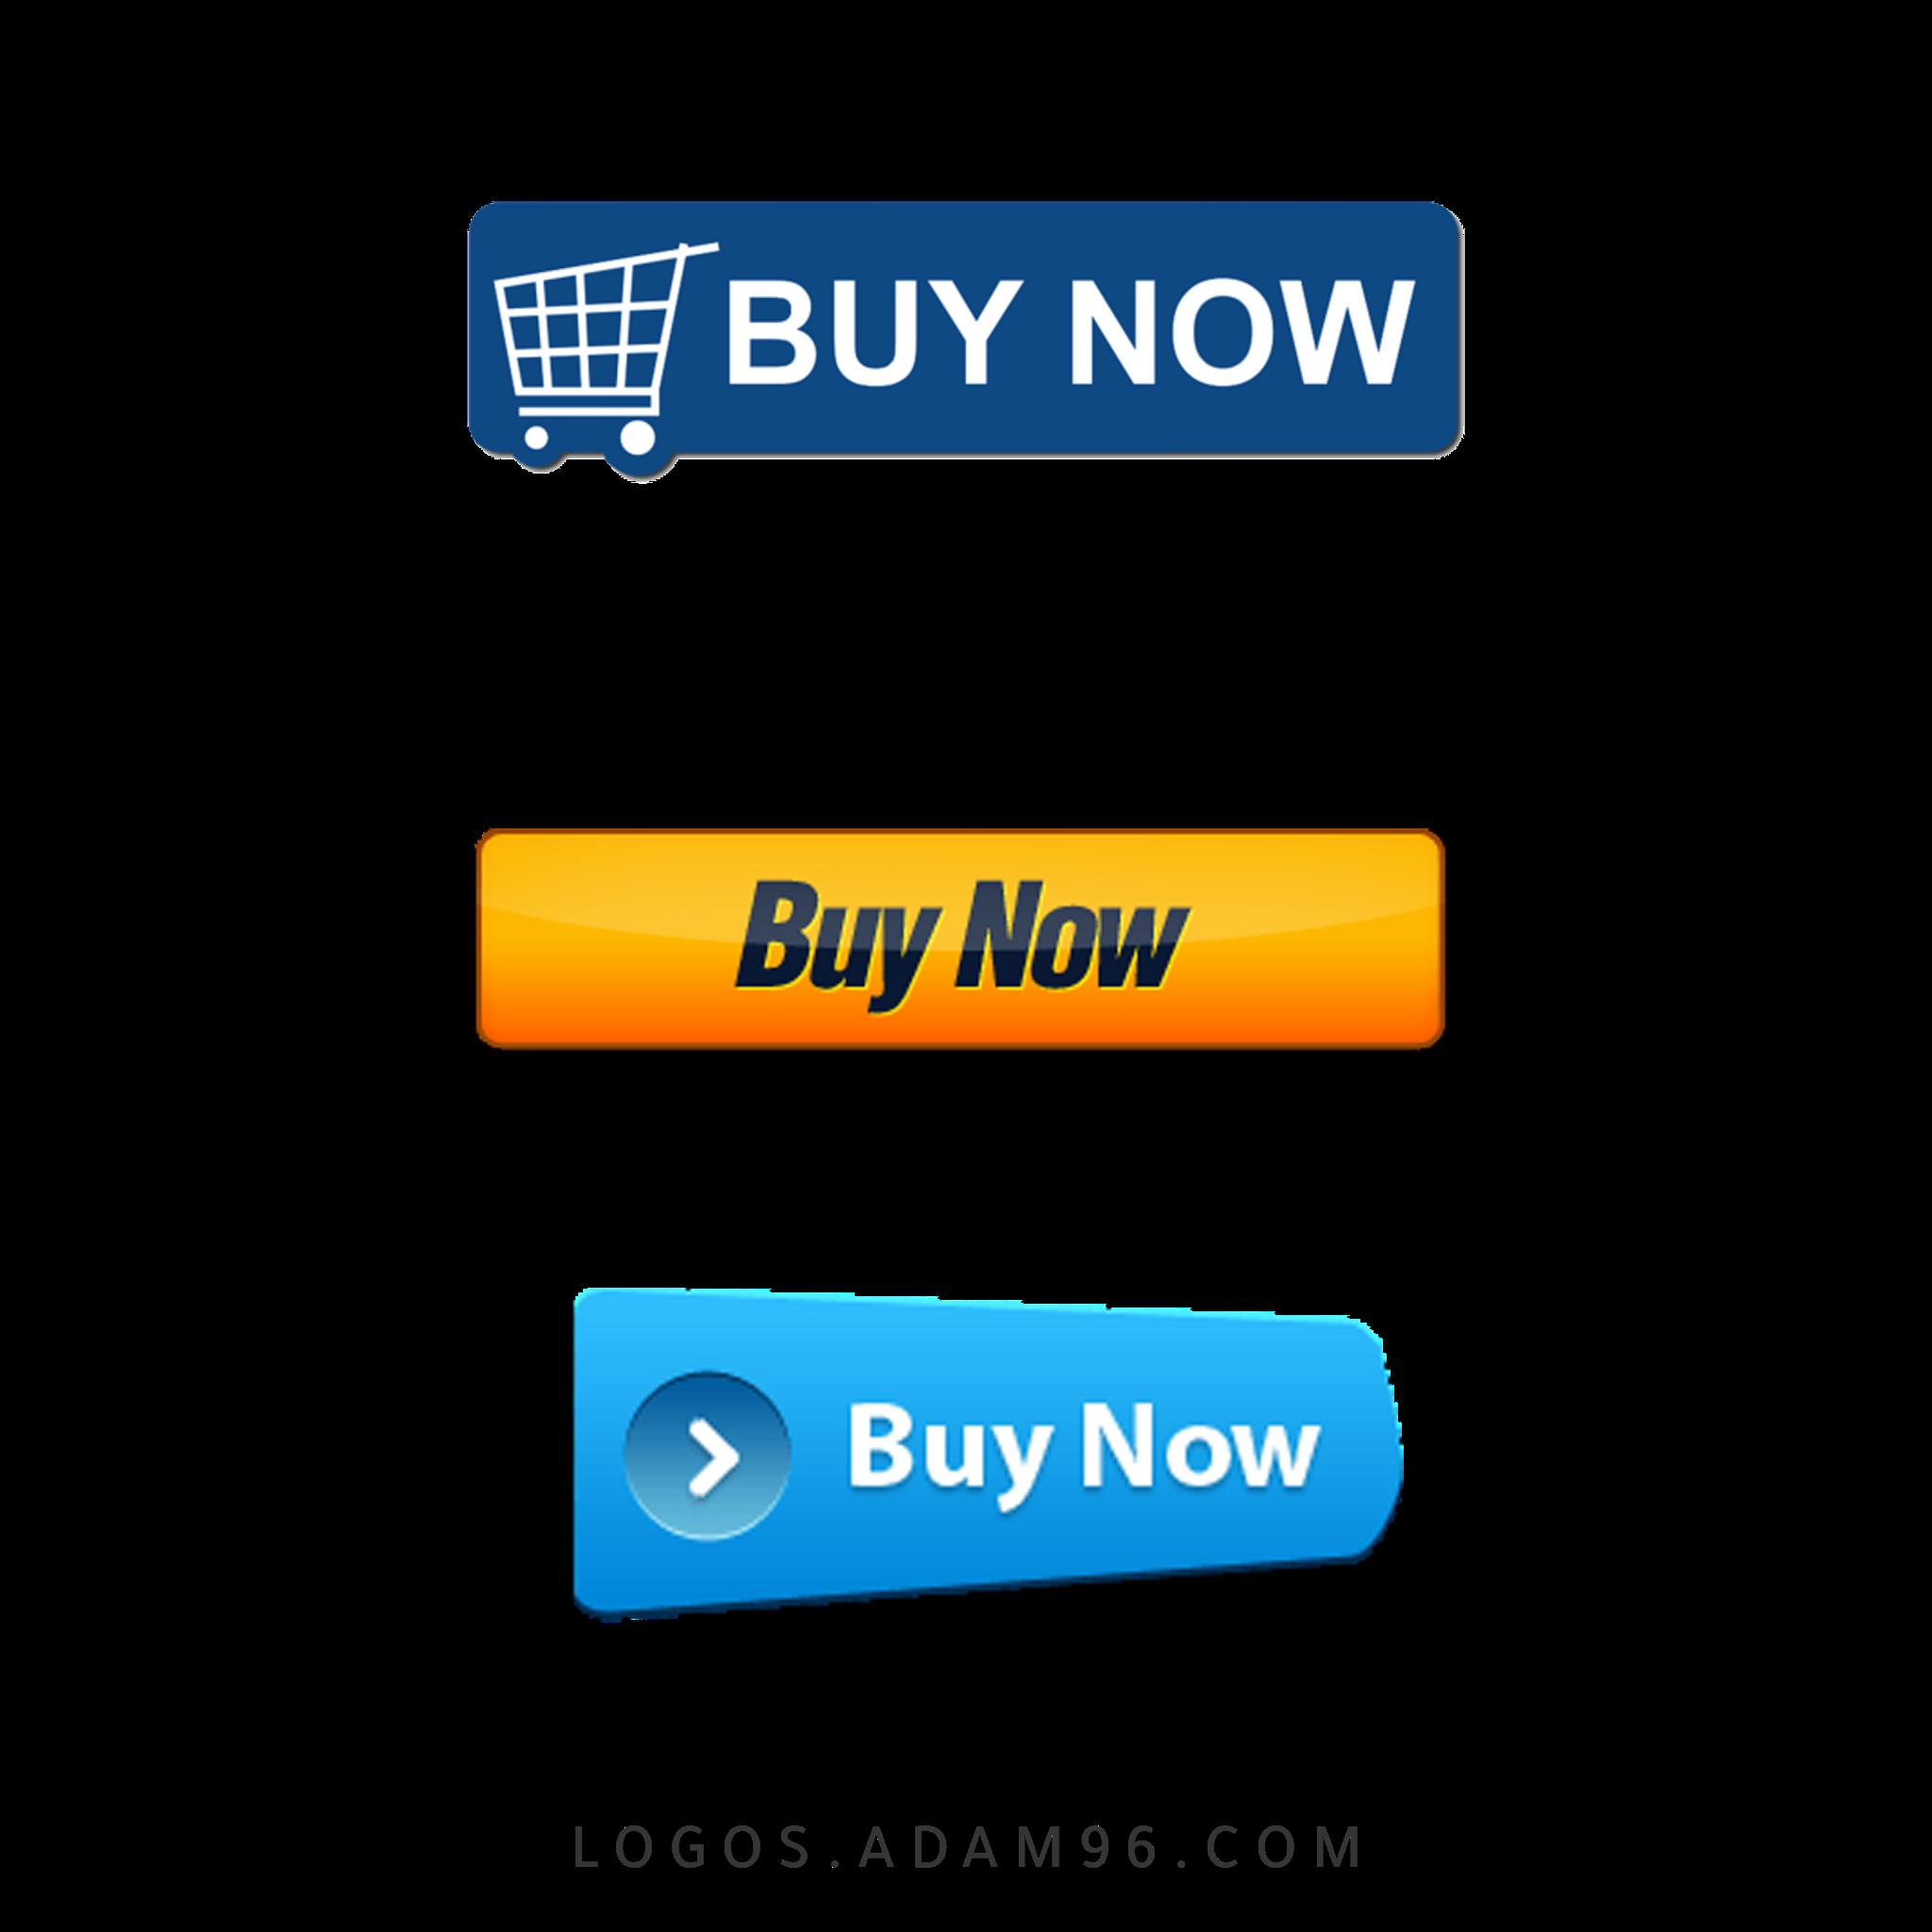 تحميل ايقونات شراء الان للتصميم اجمل ايقونات مجاناً Icon Buy Now PNG